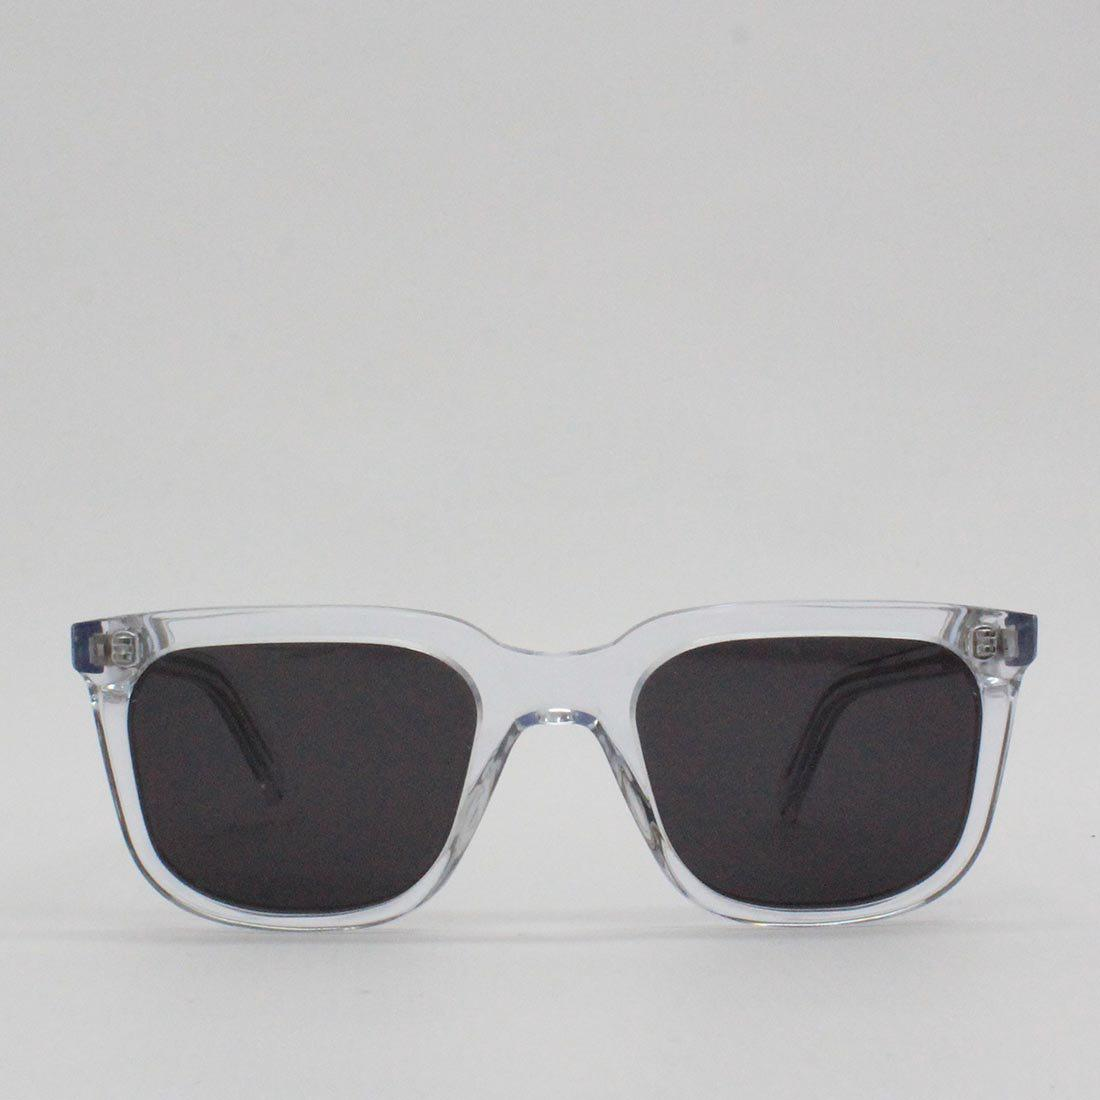 5837183b2805f Monokel Eyewear Robotnik Sunglasses Crystal for Men - Lyst